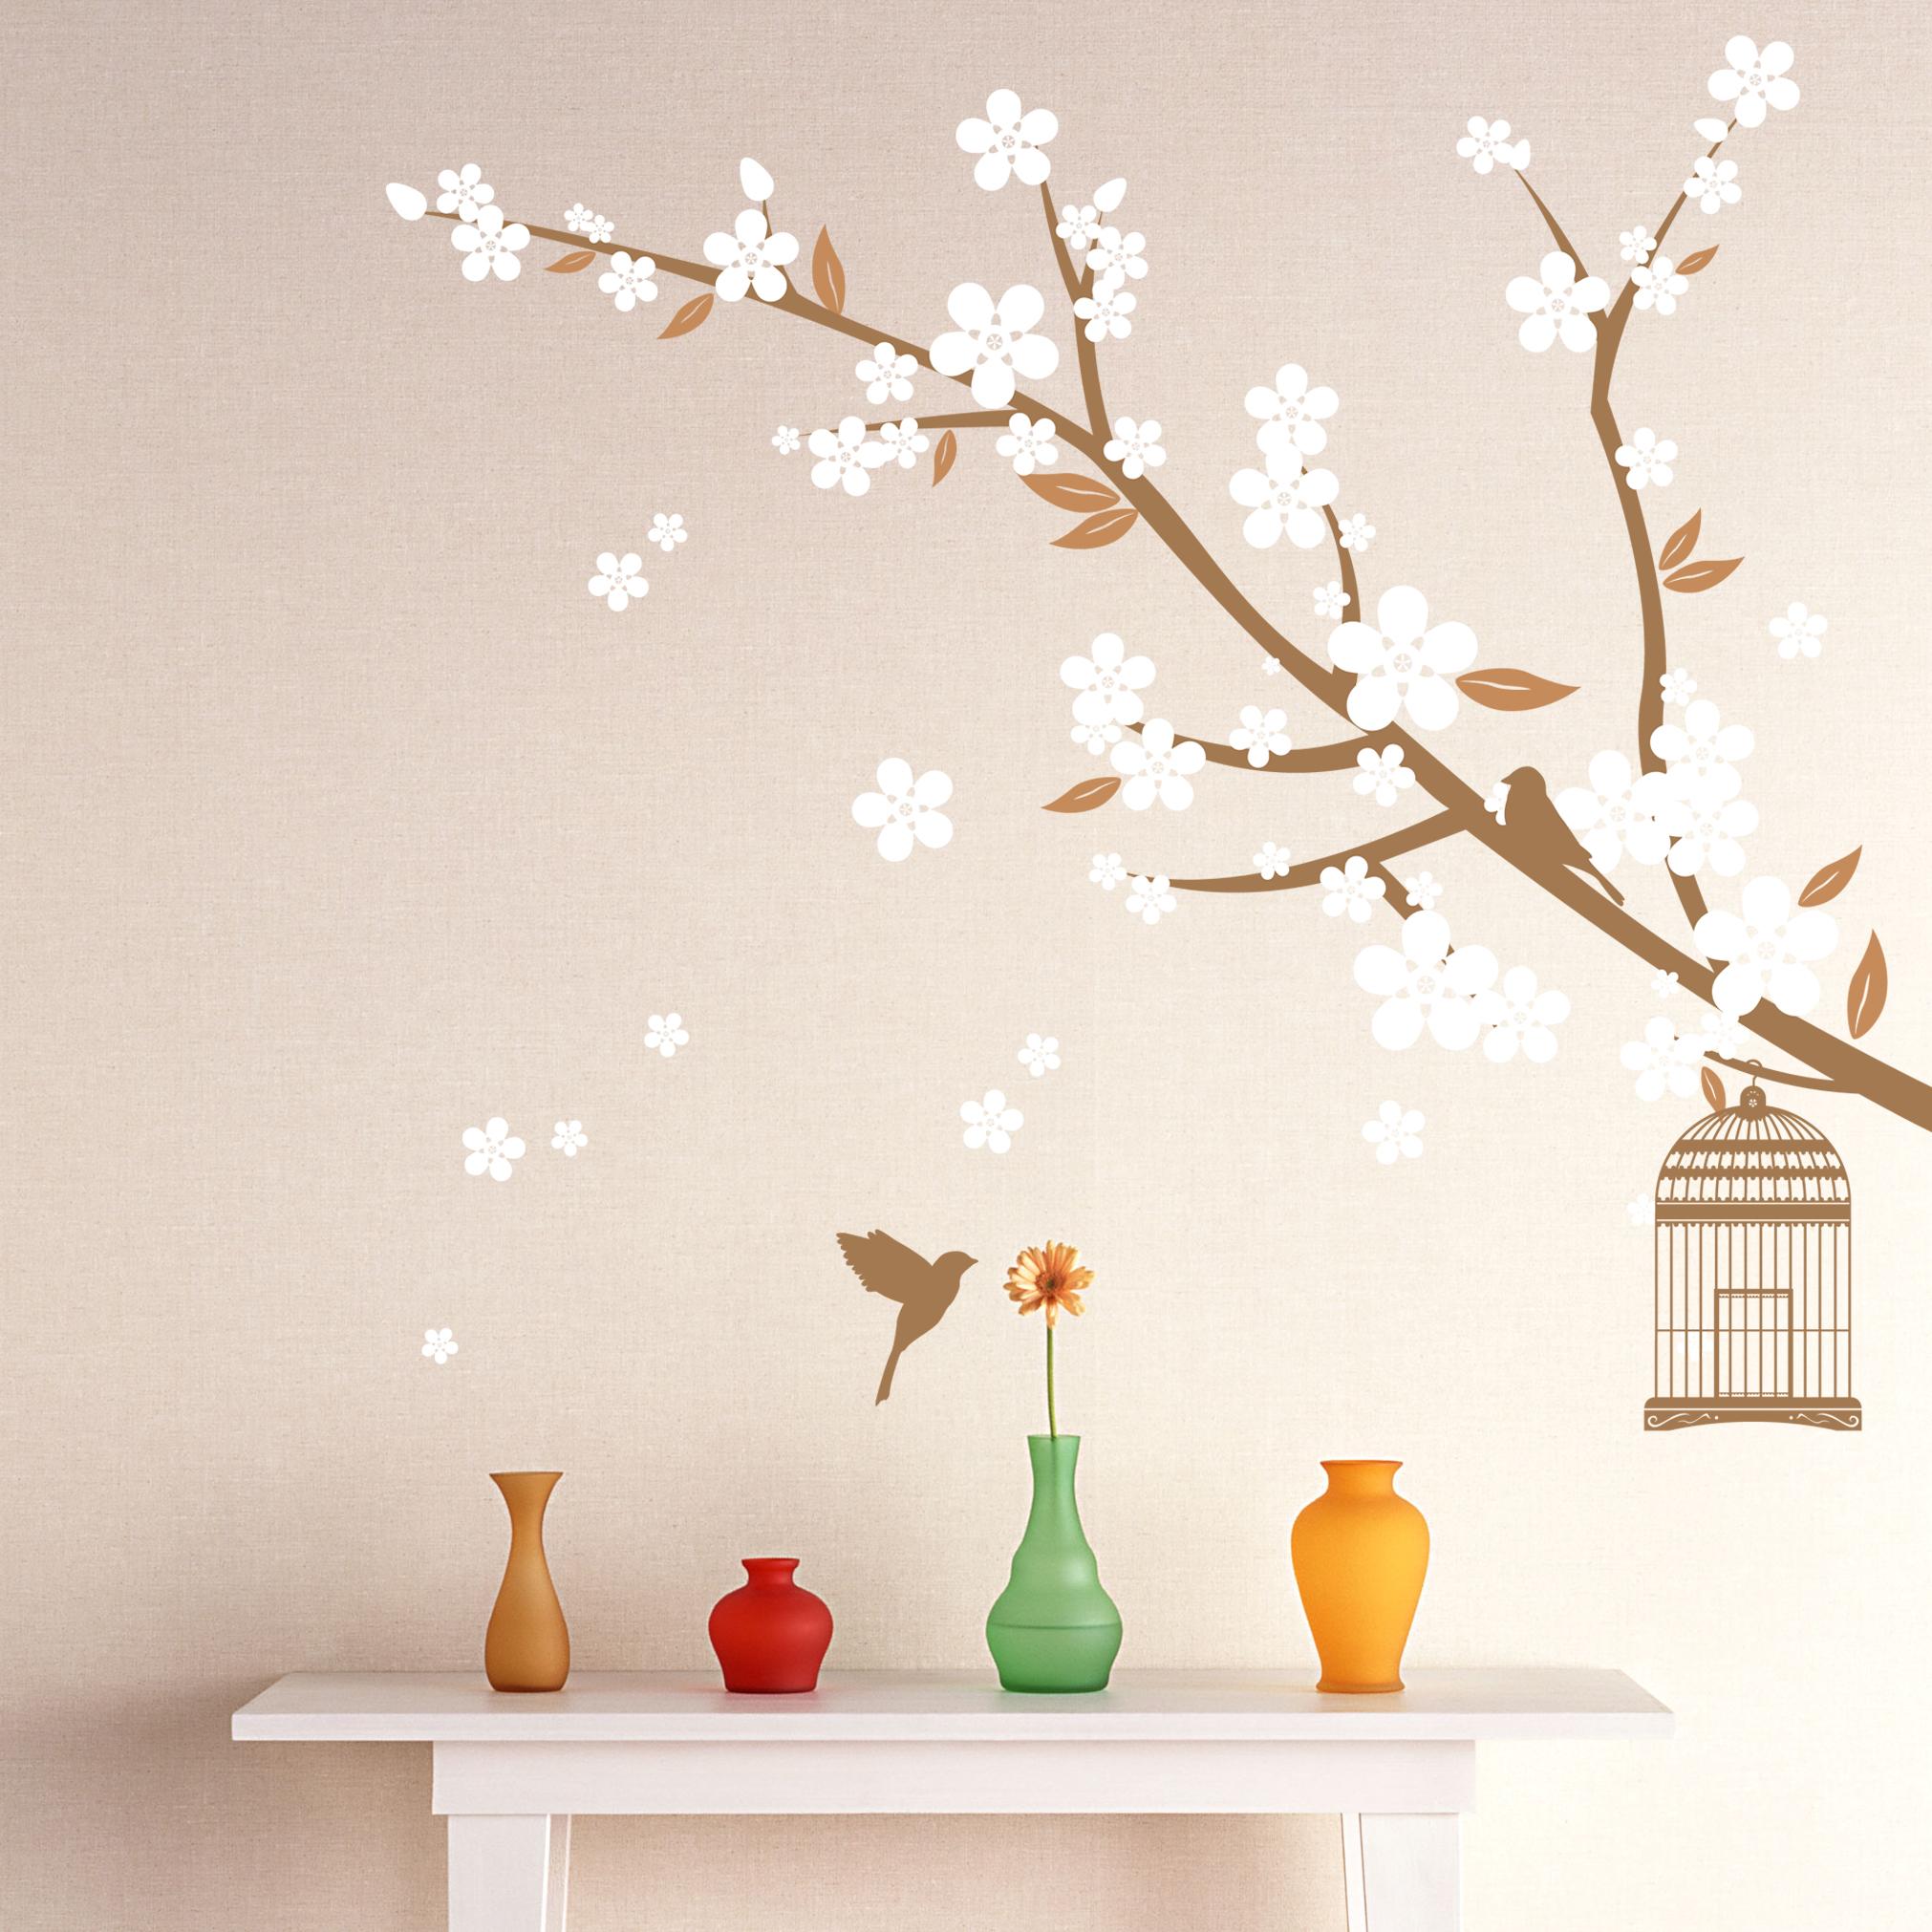 wall decals hiimaanimalhotra cherry blossom sandybrown caramel white